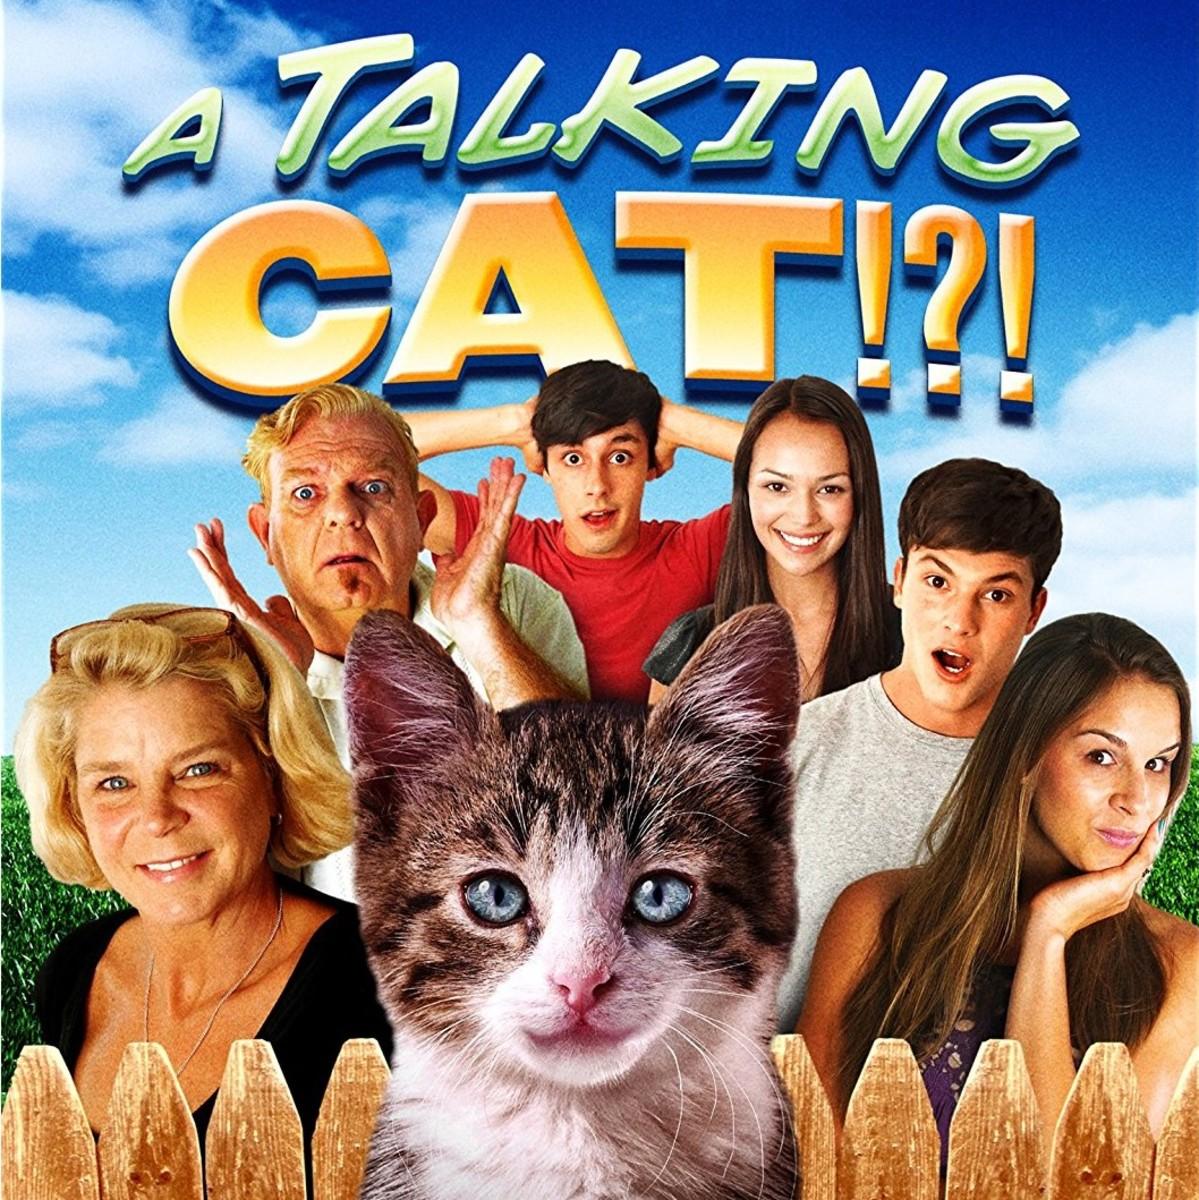 crappy-kid-movie-alert-beware-of-a-talking-cat